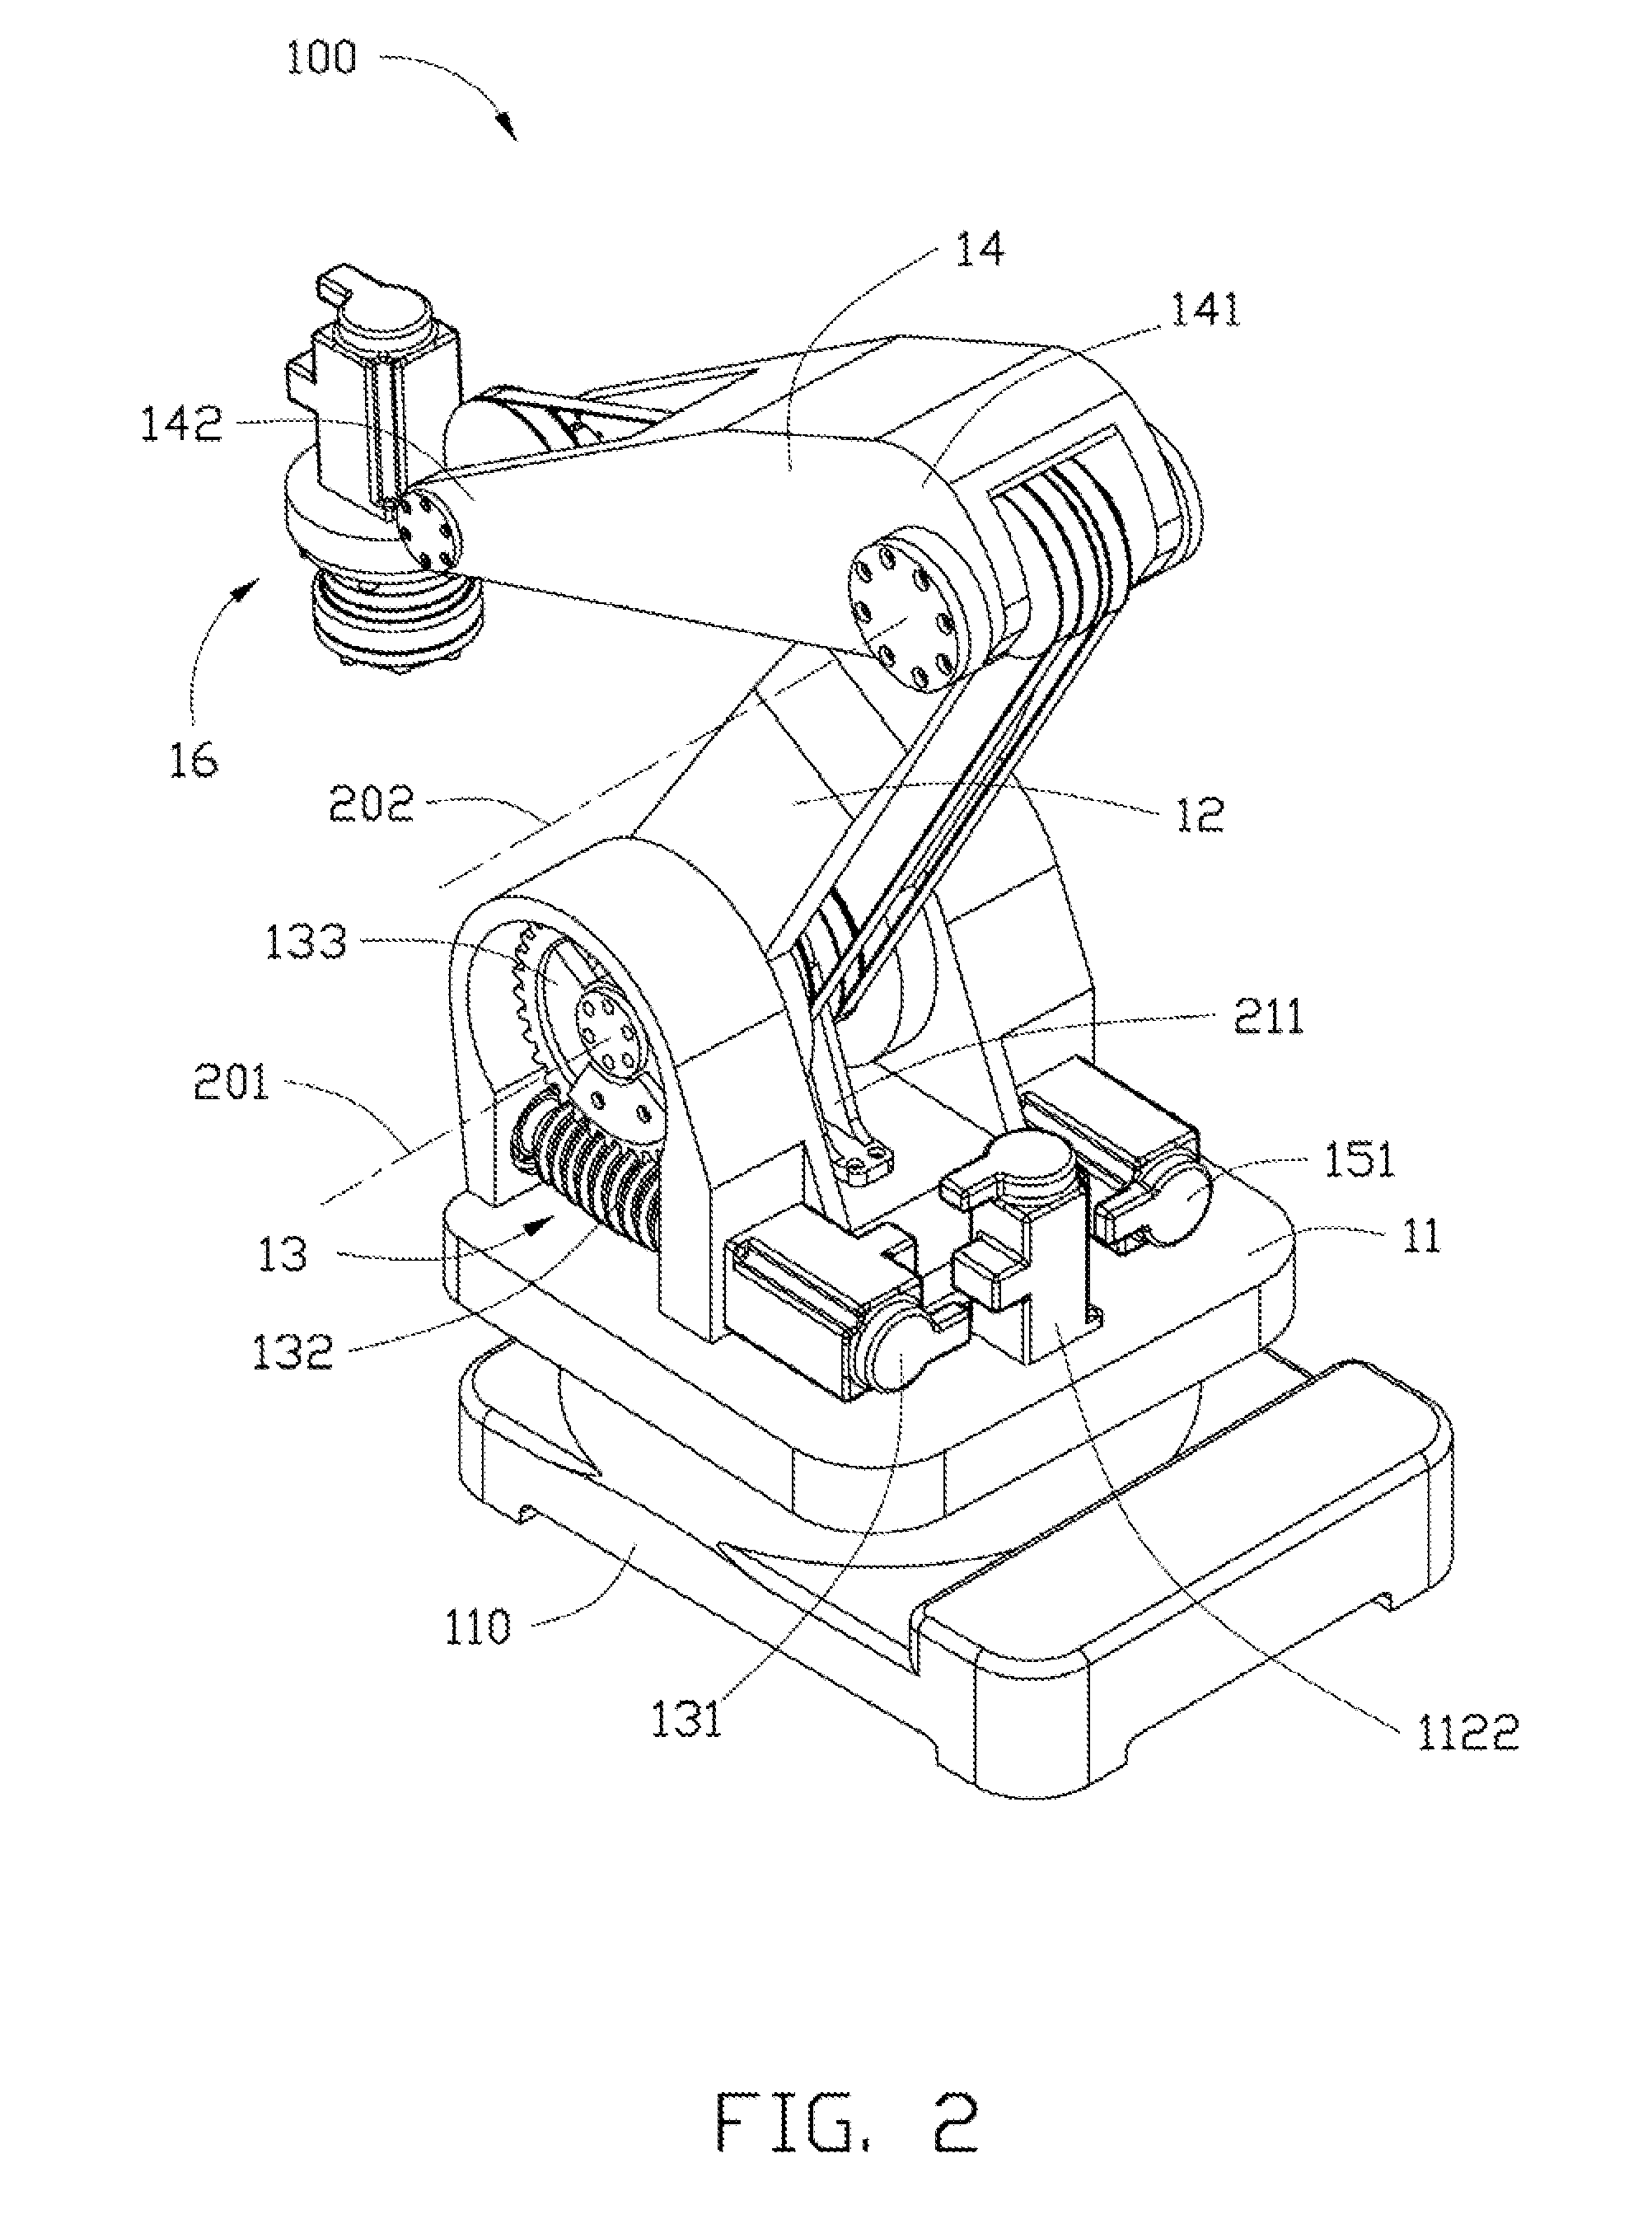 patent us20120048047 - robot arm system